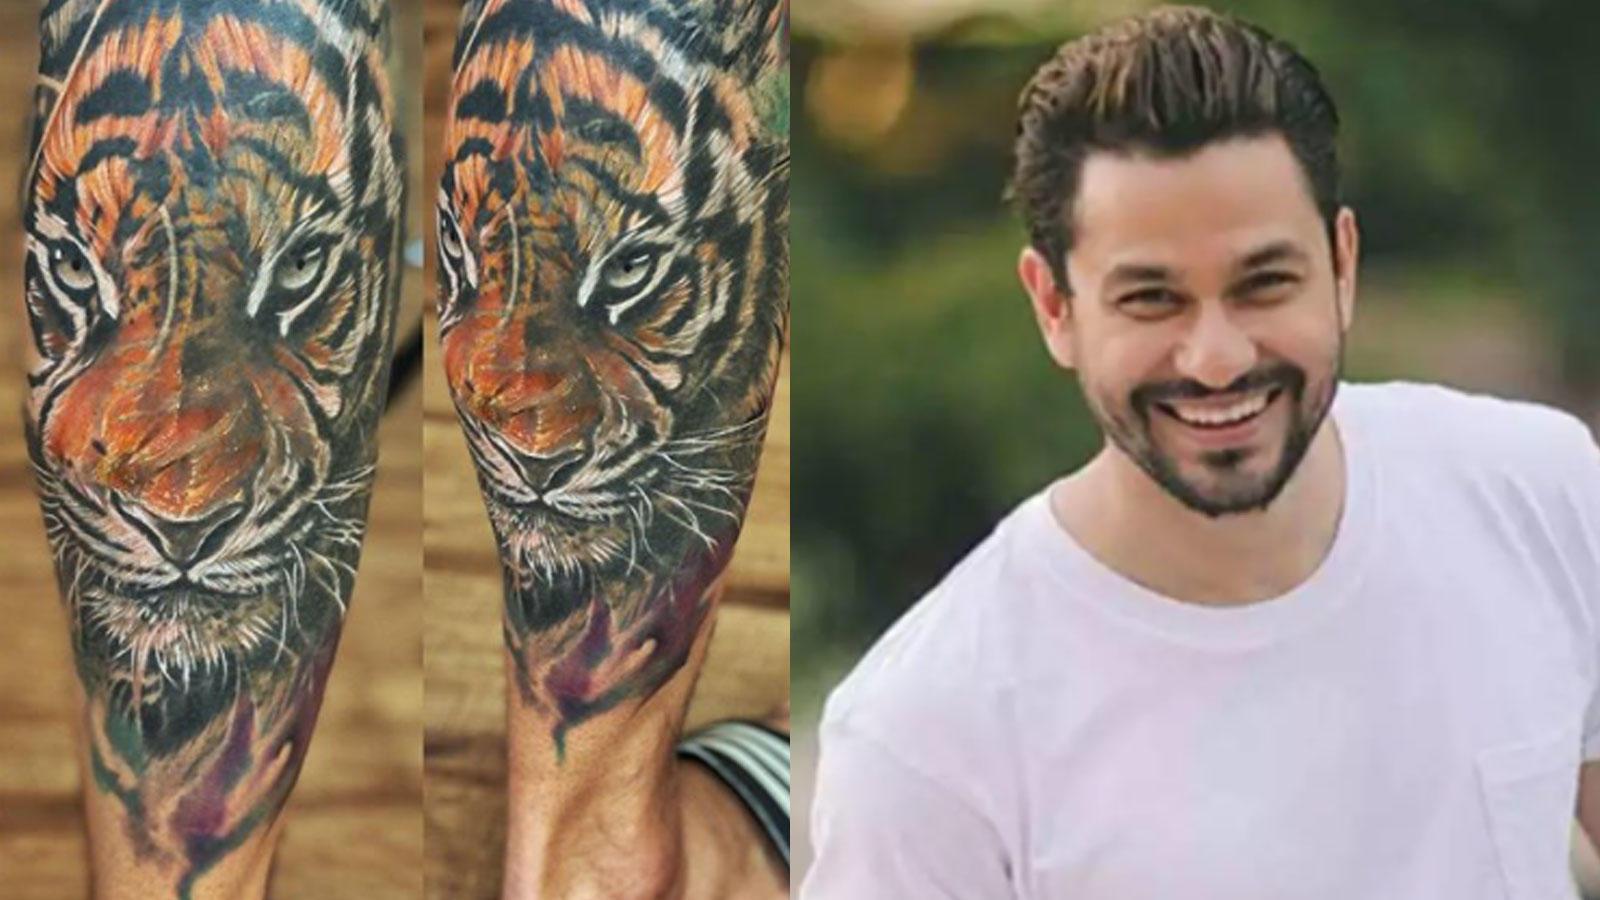 kunal-kemmu-flaunts-tiger-face-tattoo-in-his-latest-post